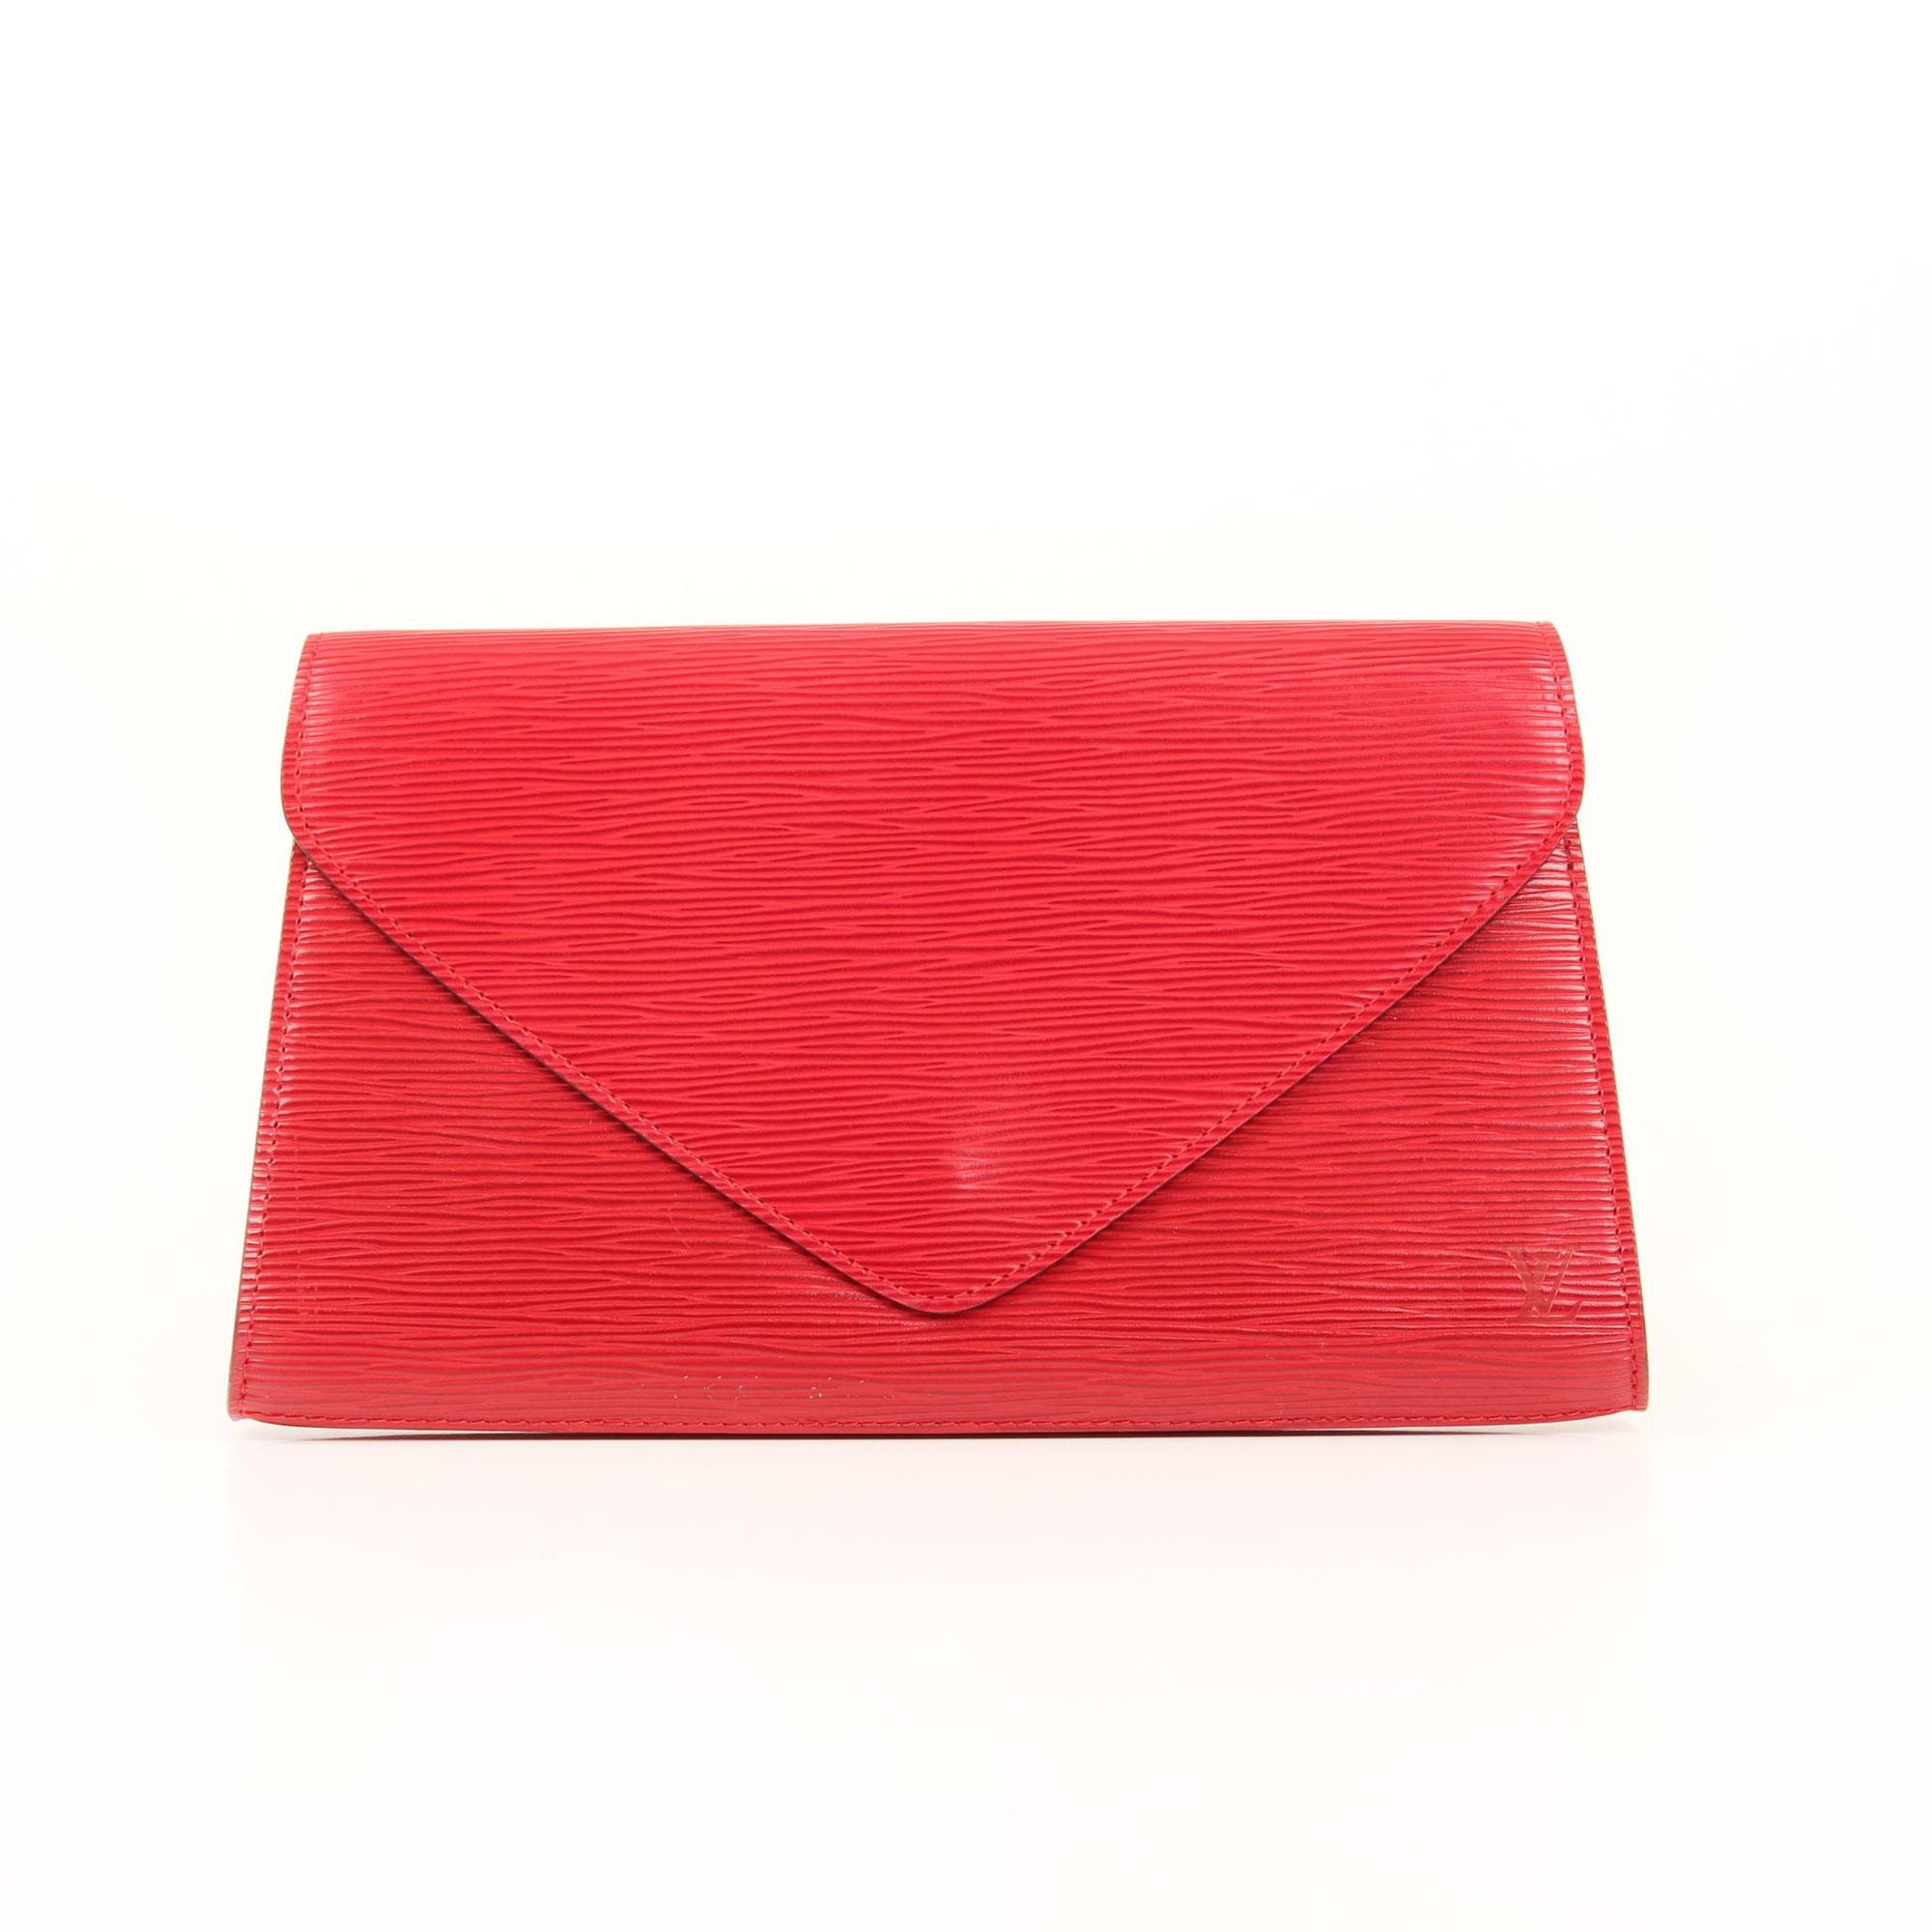 Front image of louis vuitton vintage red epi clutch